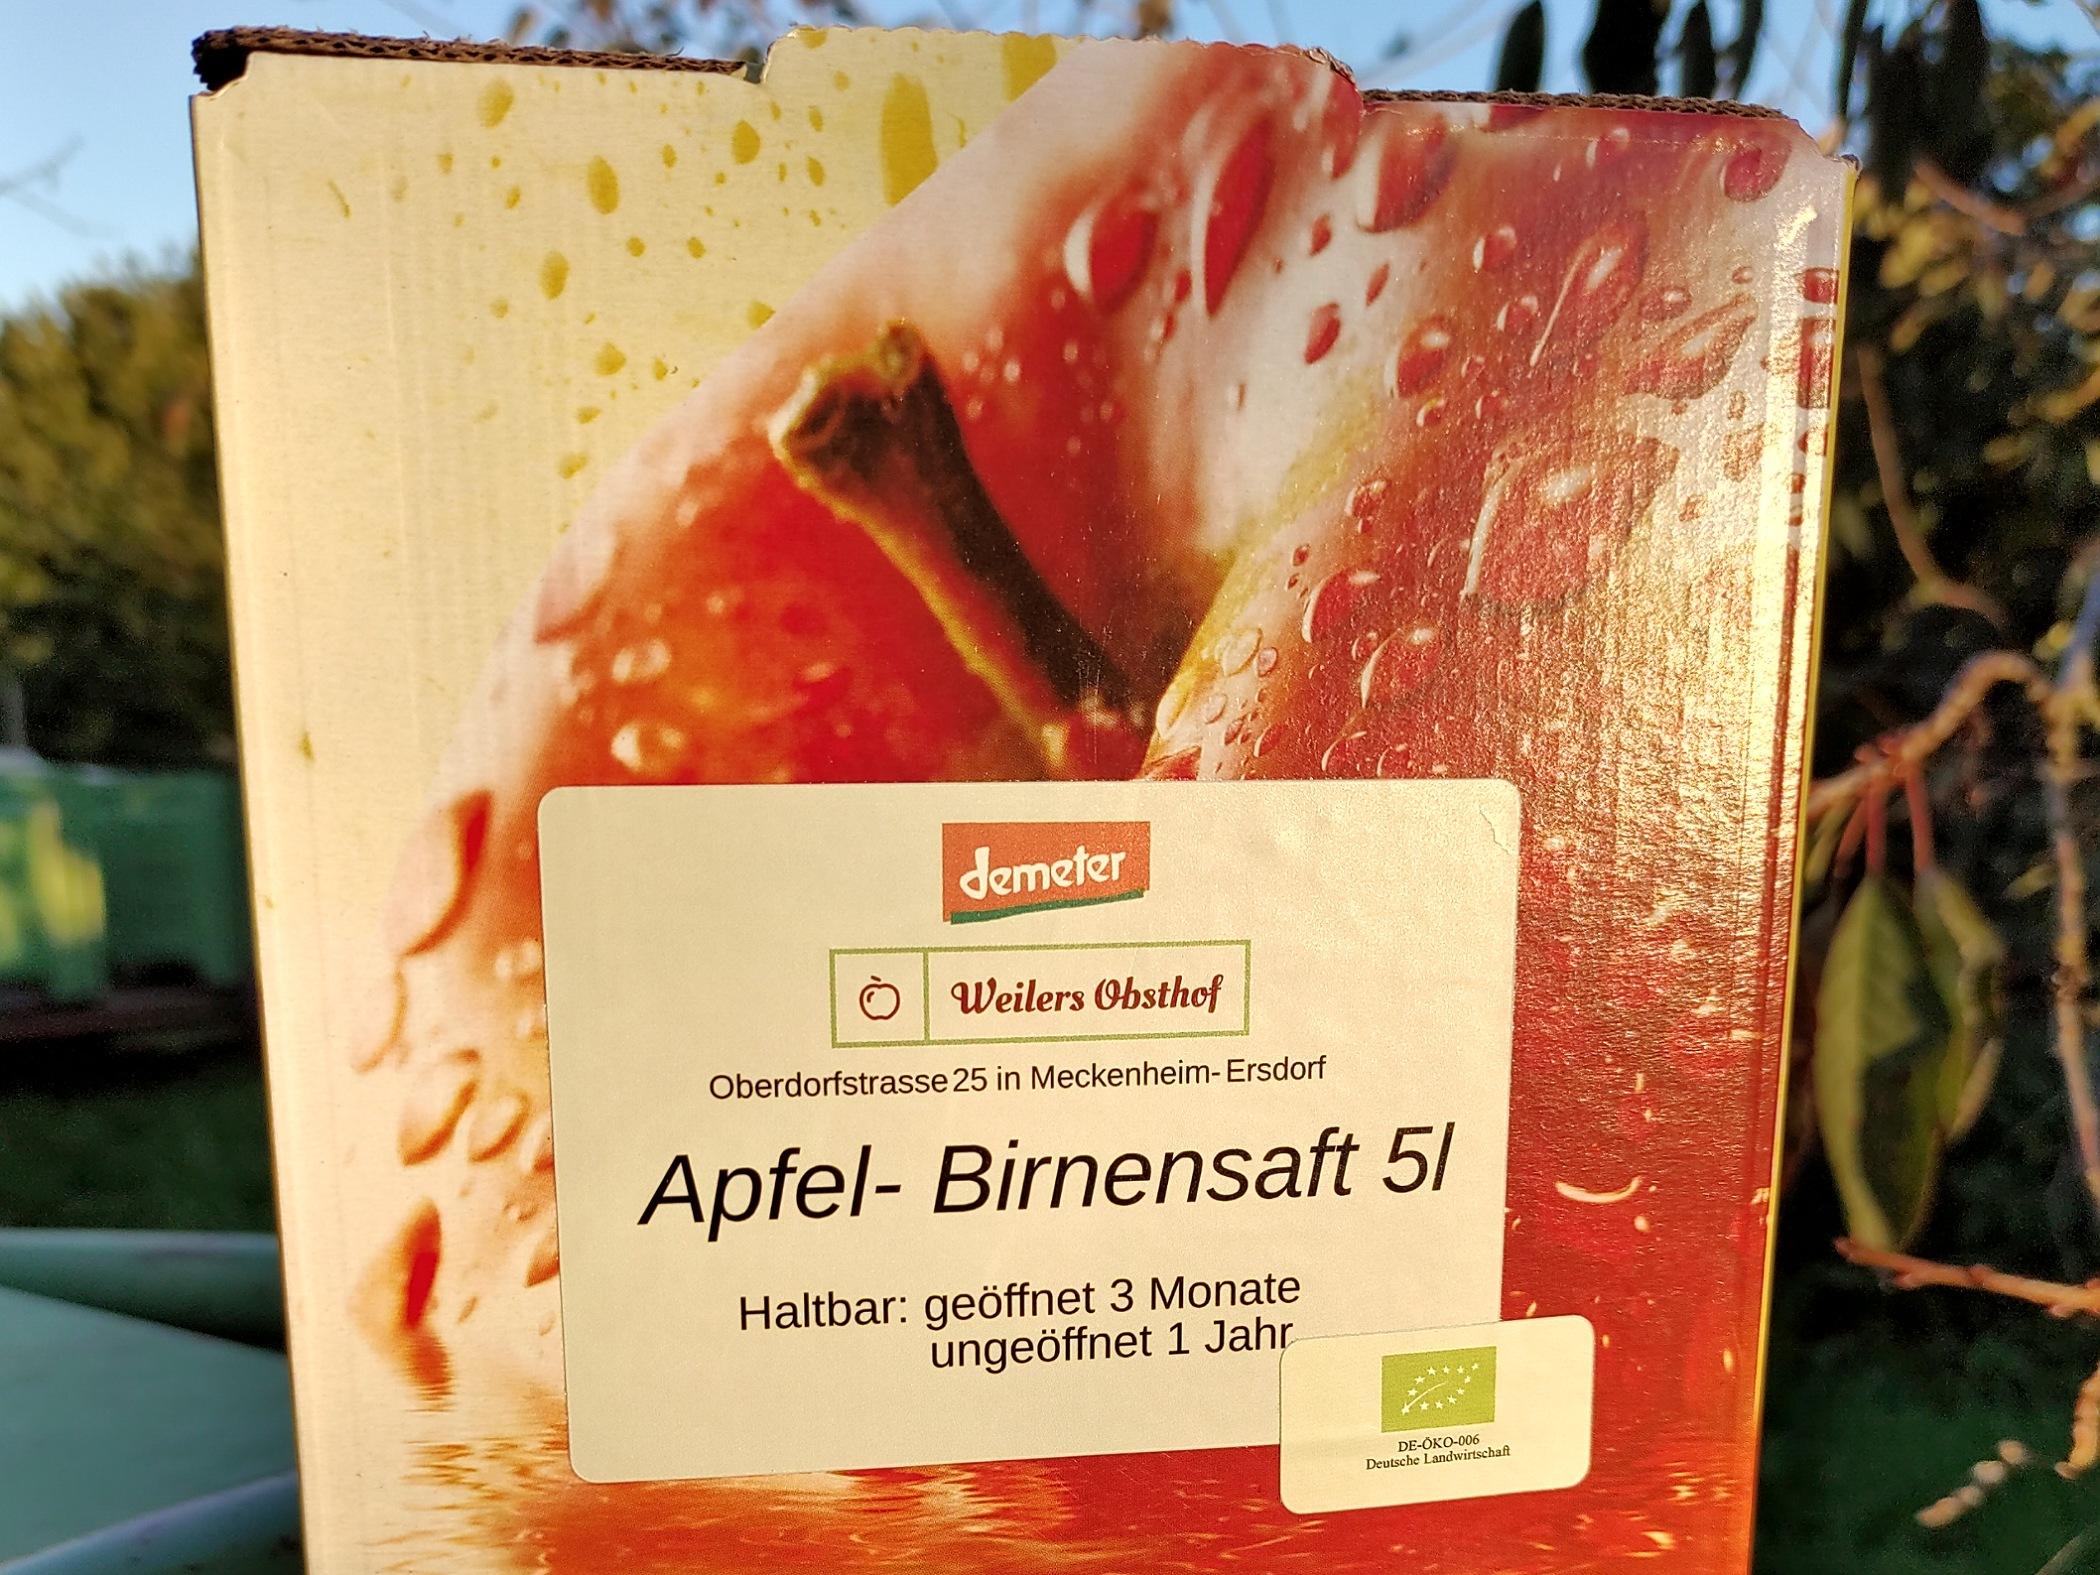 Apfel-Birnensaft | 5 l